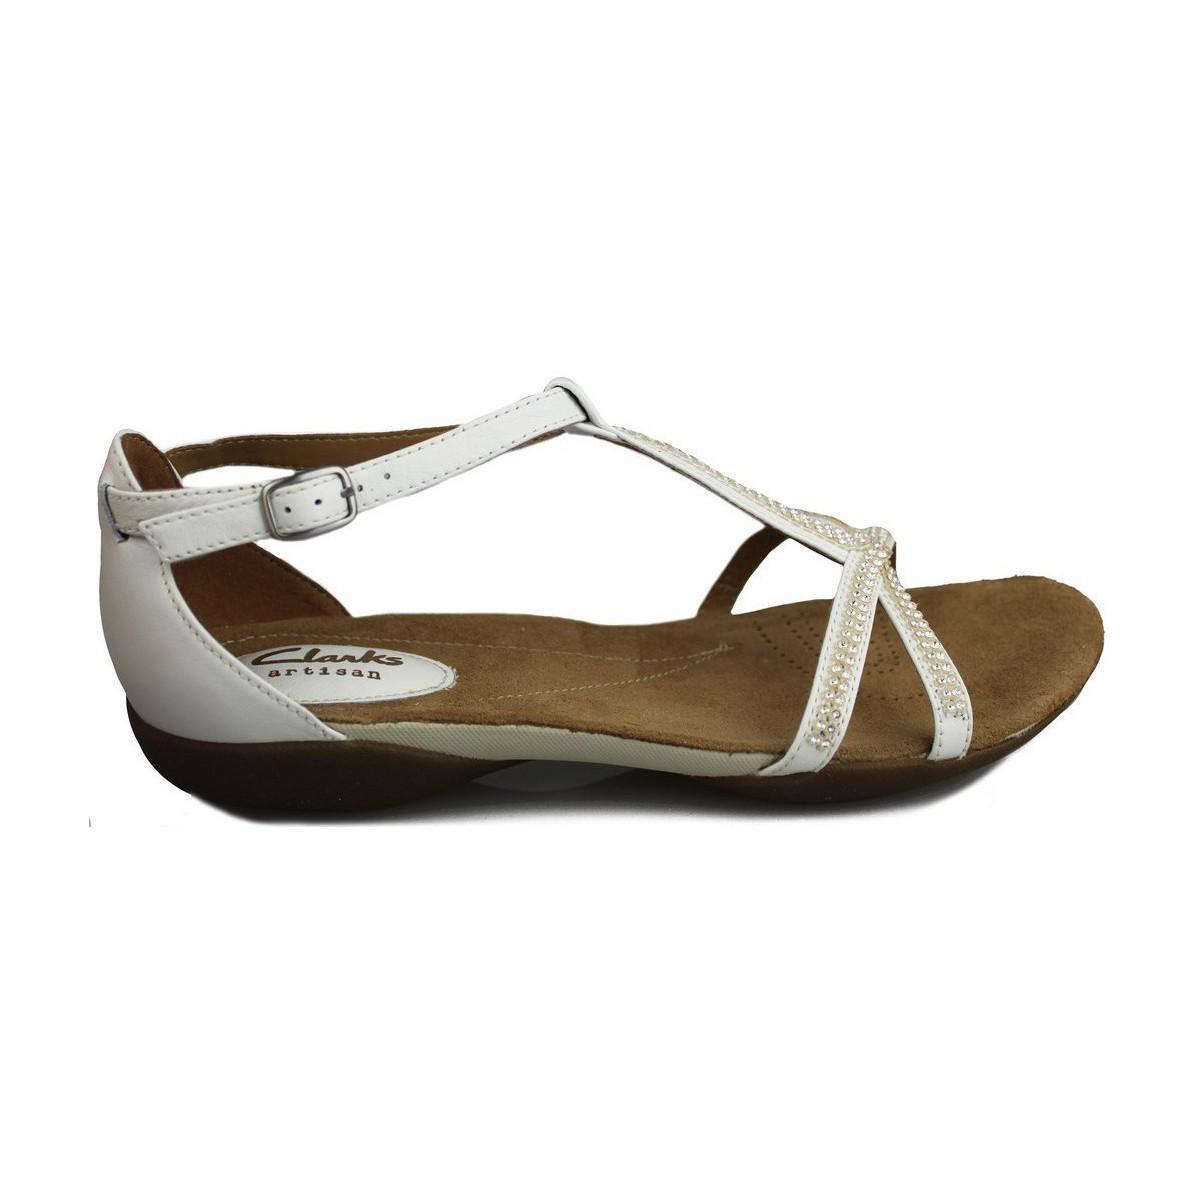 760451483 Clarks Raffi Star Women s Sandals In White in White - Lyst